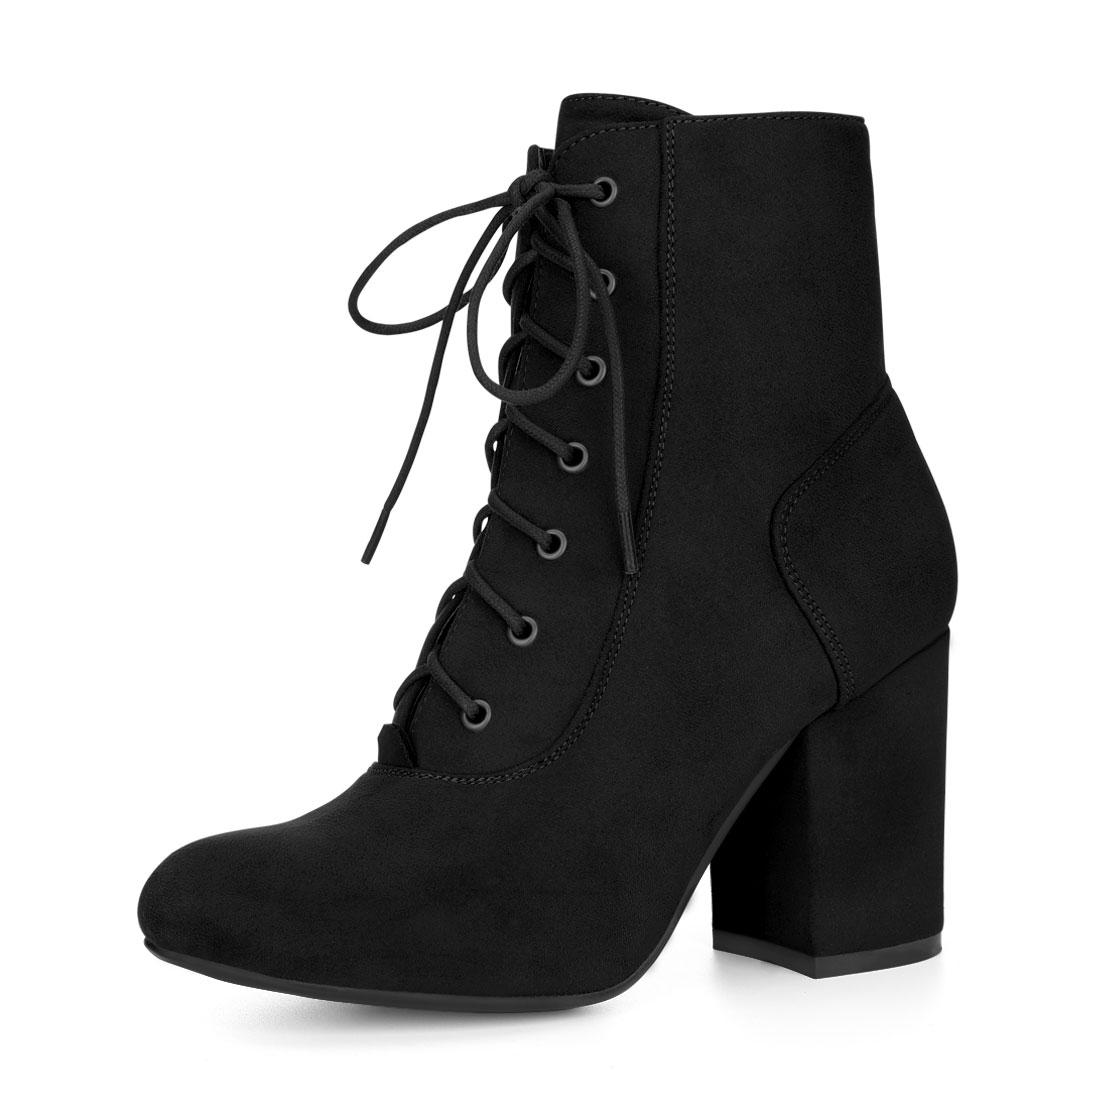 Allegra K Women Round Toe Chunky High Heel Lace Up Booties Black US 9